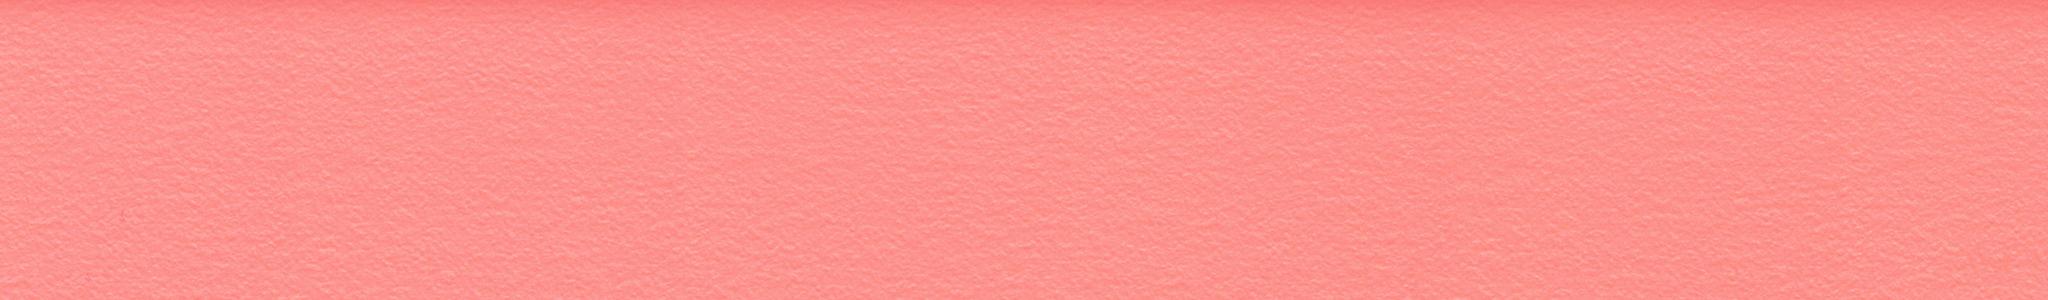 HU 130326 кромка ABS красная жемчуг тонкая структура 107